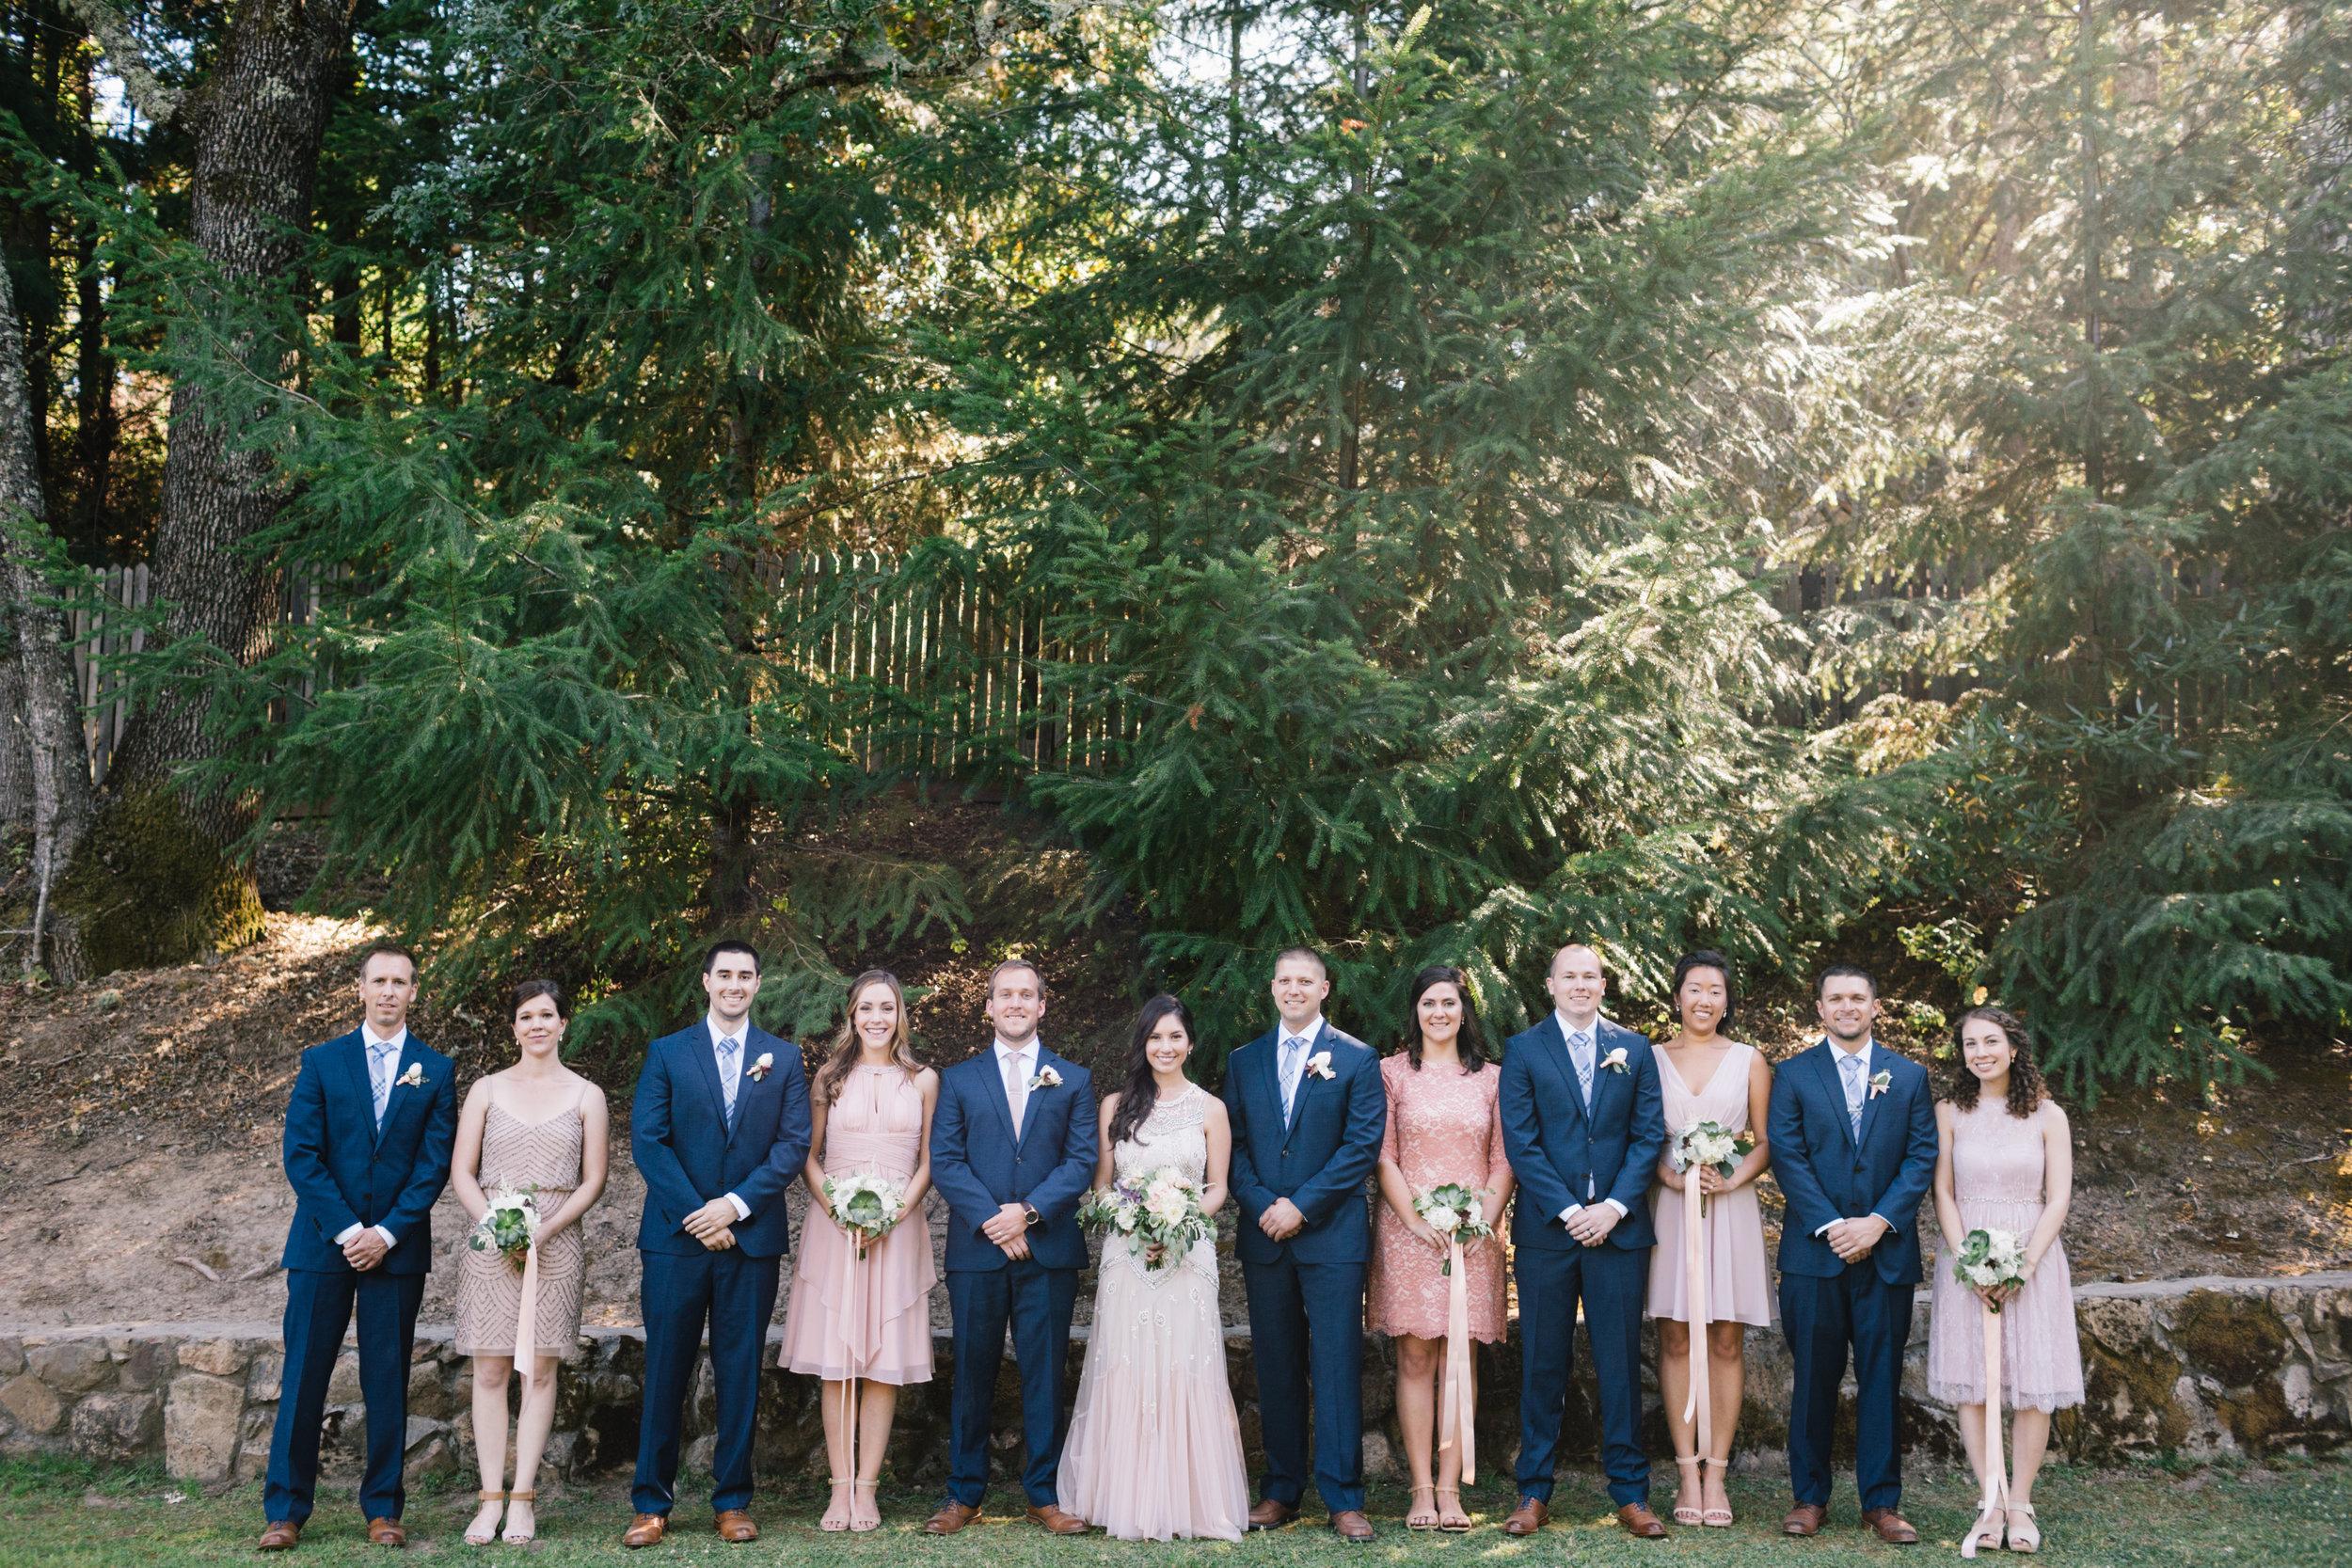 LishaWangPhotography_Carly_Matt_Wedding-123.jpg